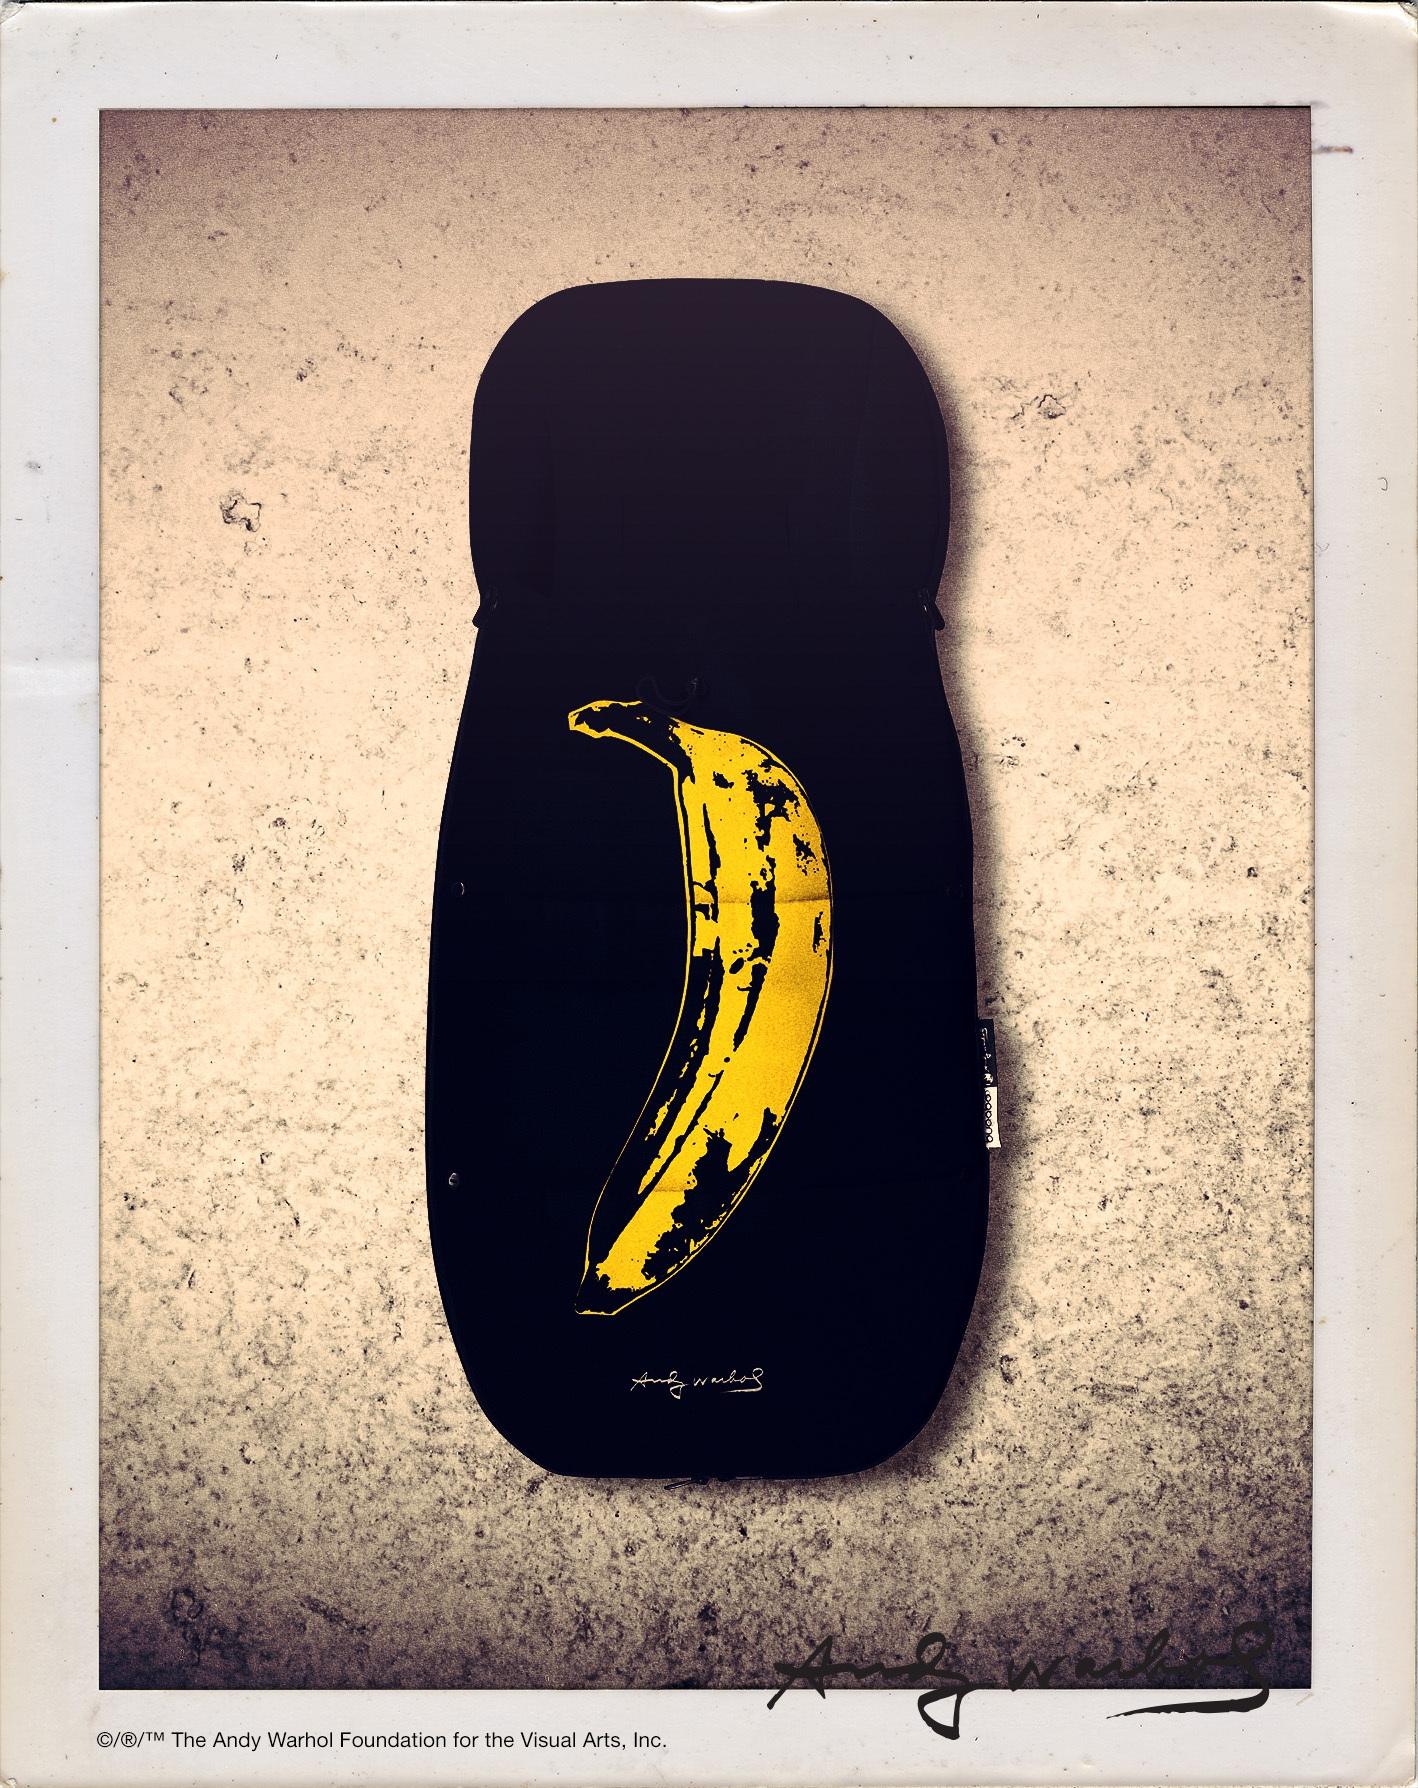 Bugaboo + Andy Warhol